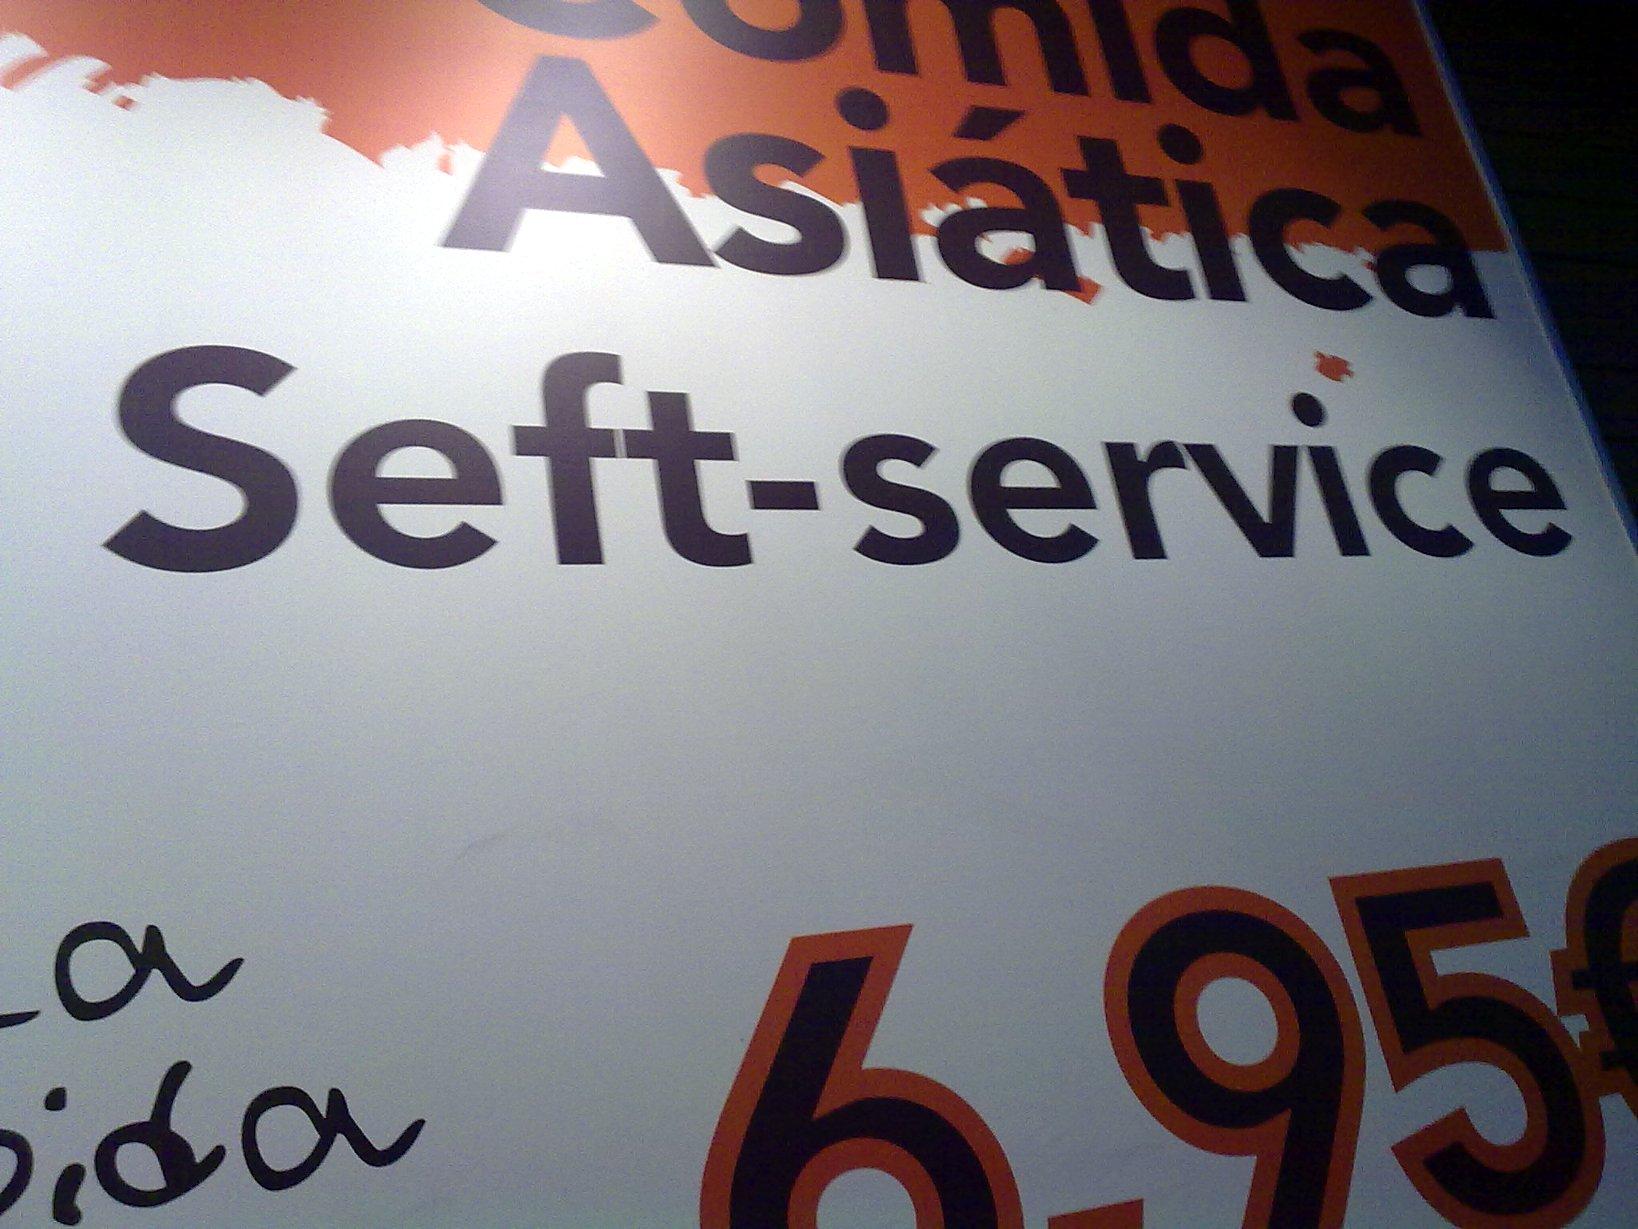 Seft-service